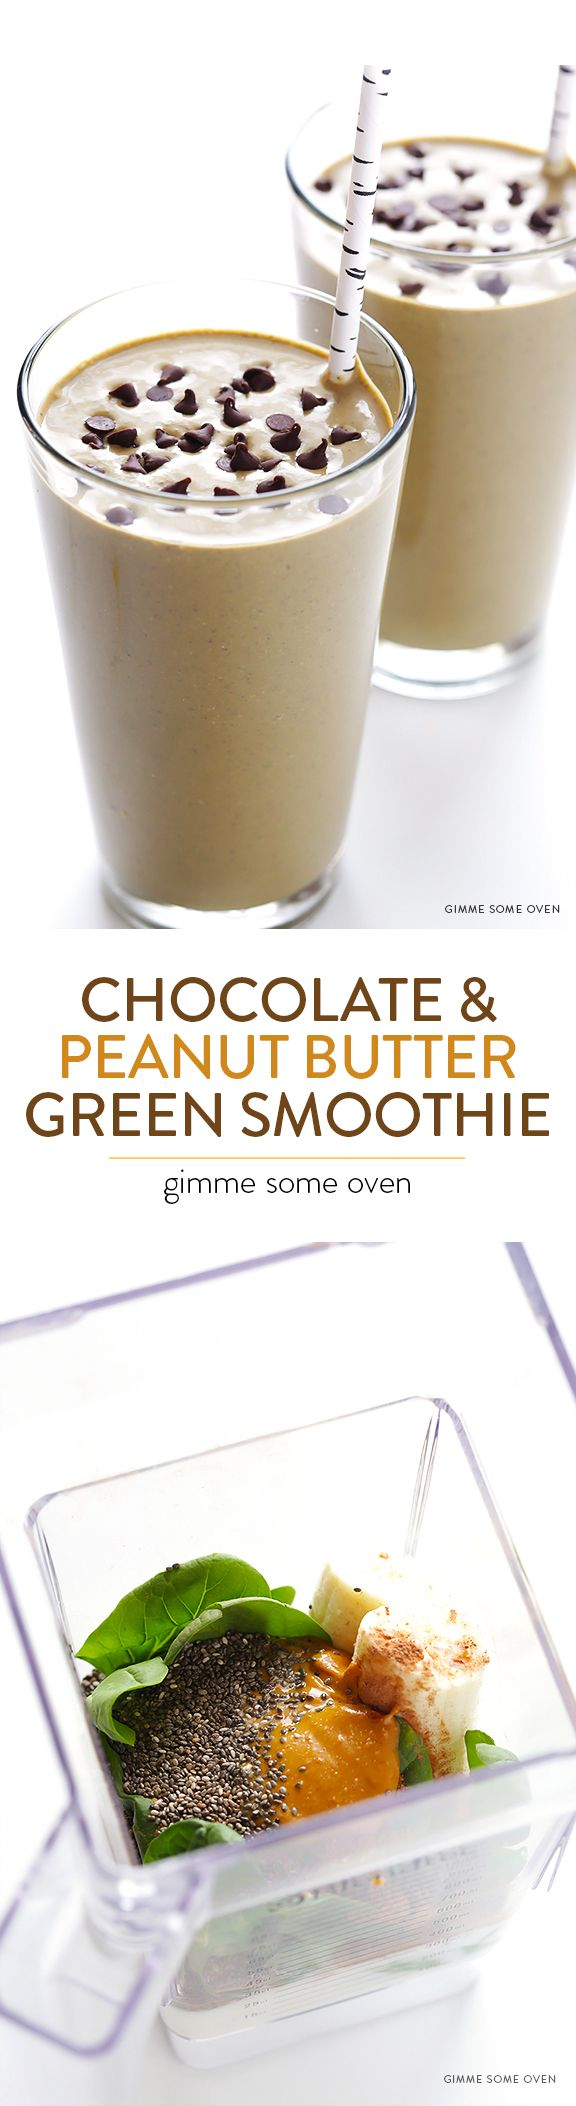 Best 25+ Chocolate peanut butter smoothie ideas on Pinterest ...